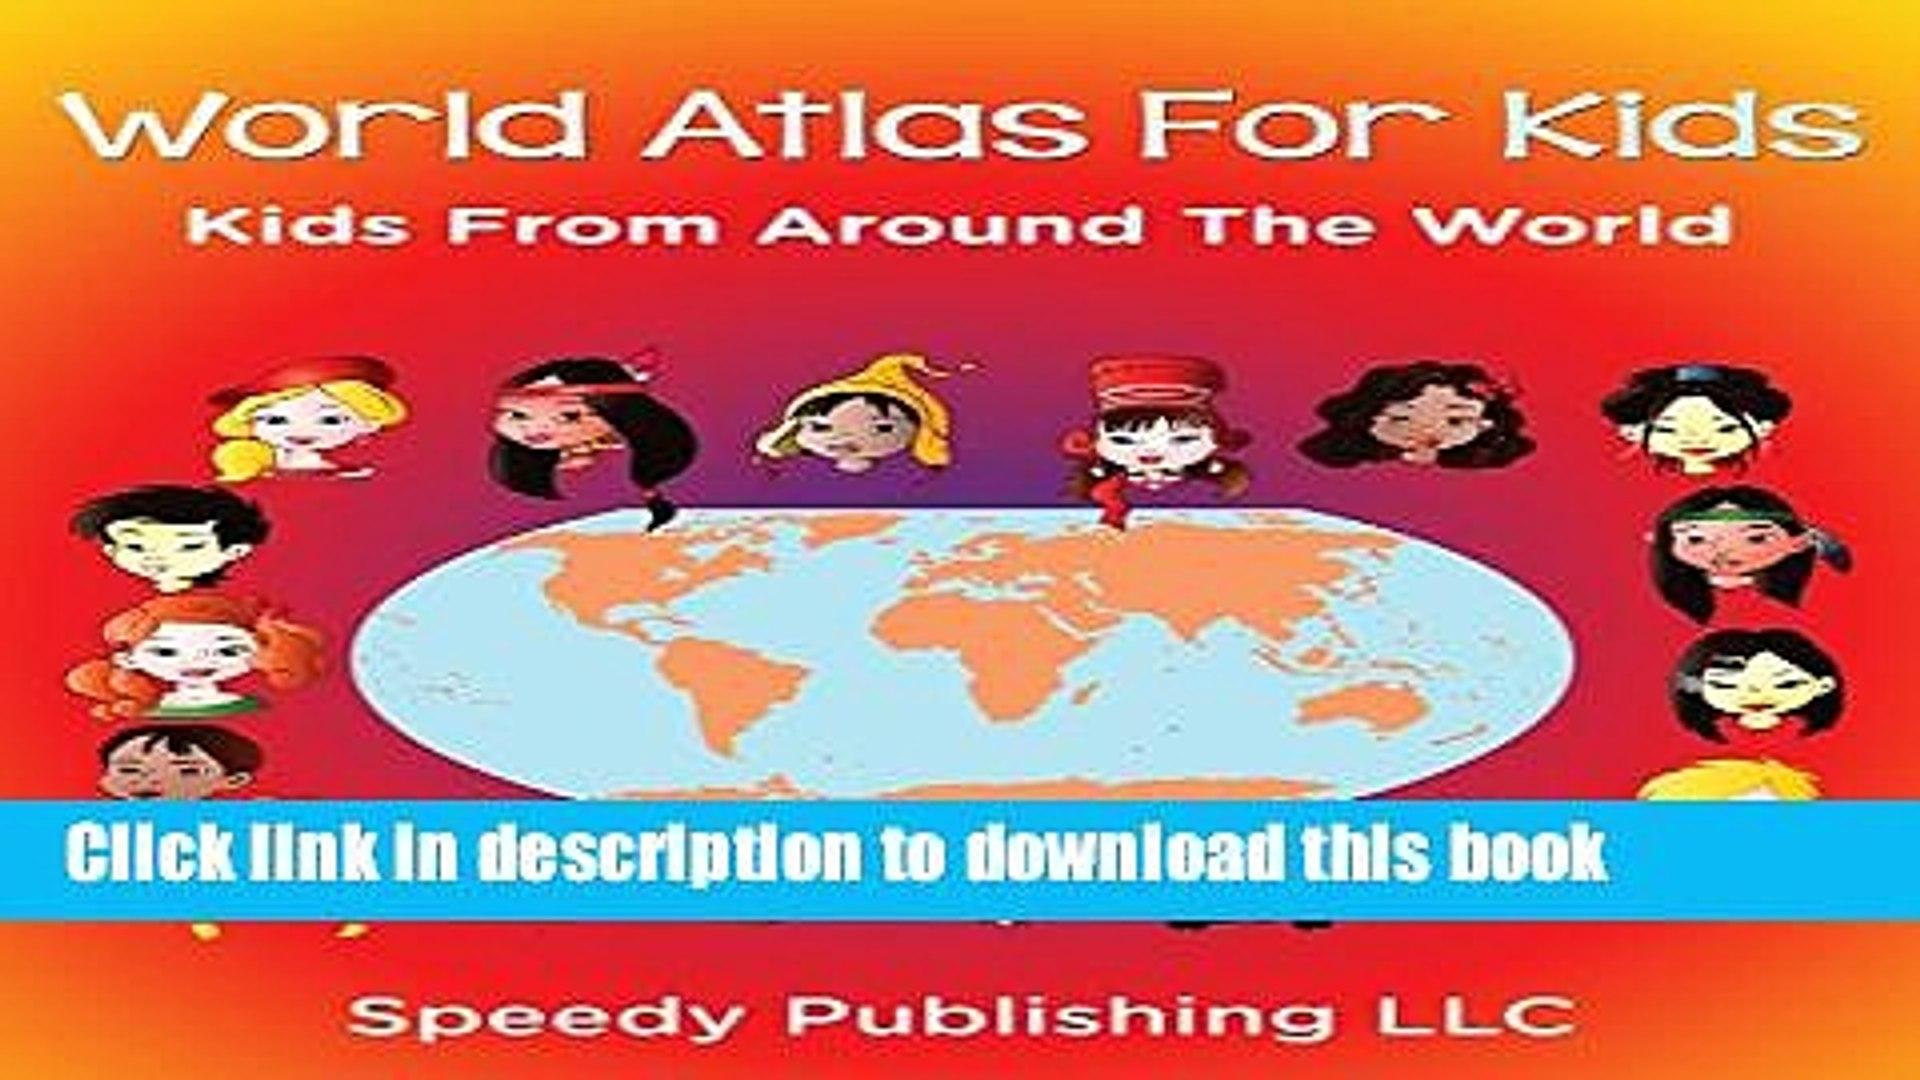 [Popular Books] World Atlas For Kids - Kids From Around The World Free Online